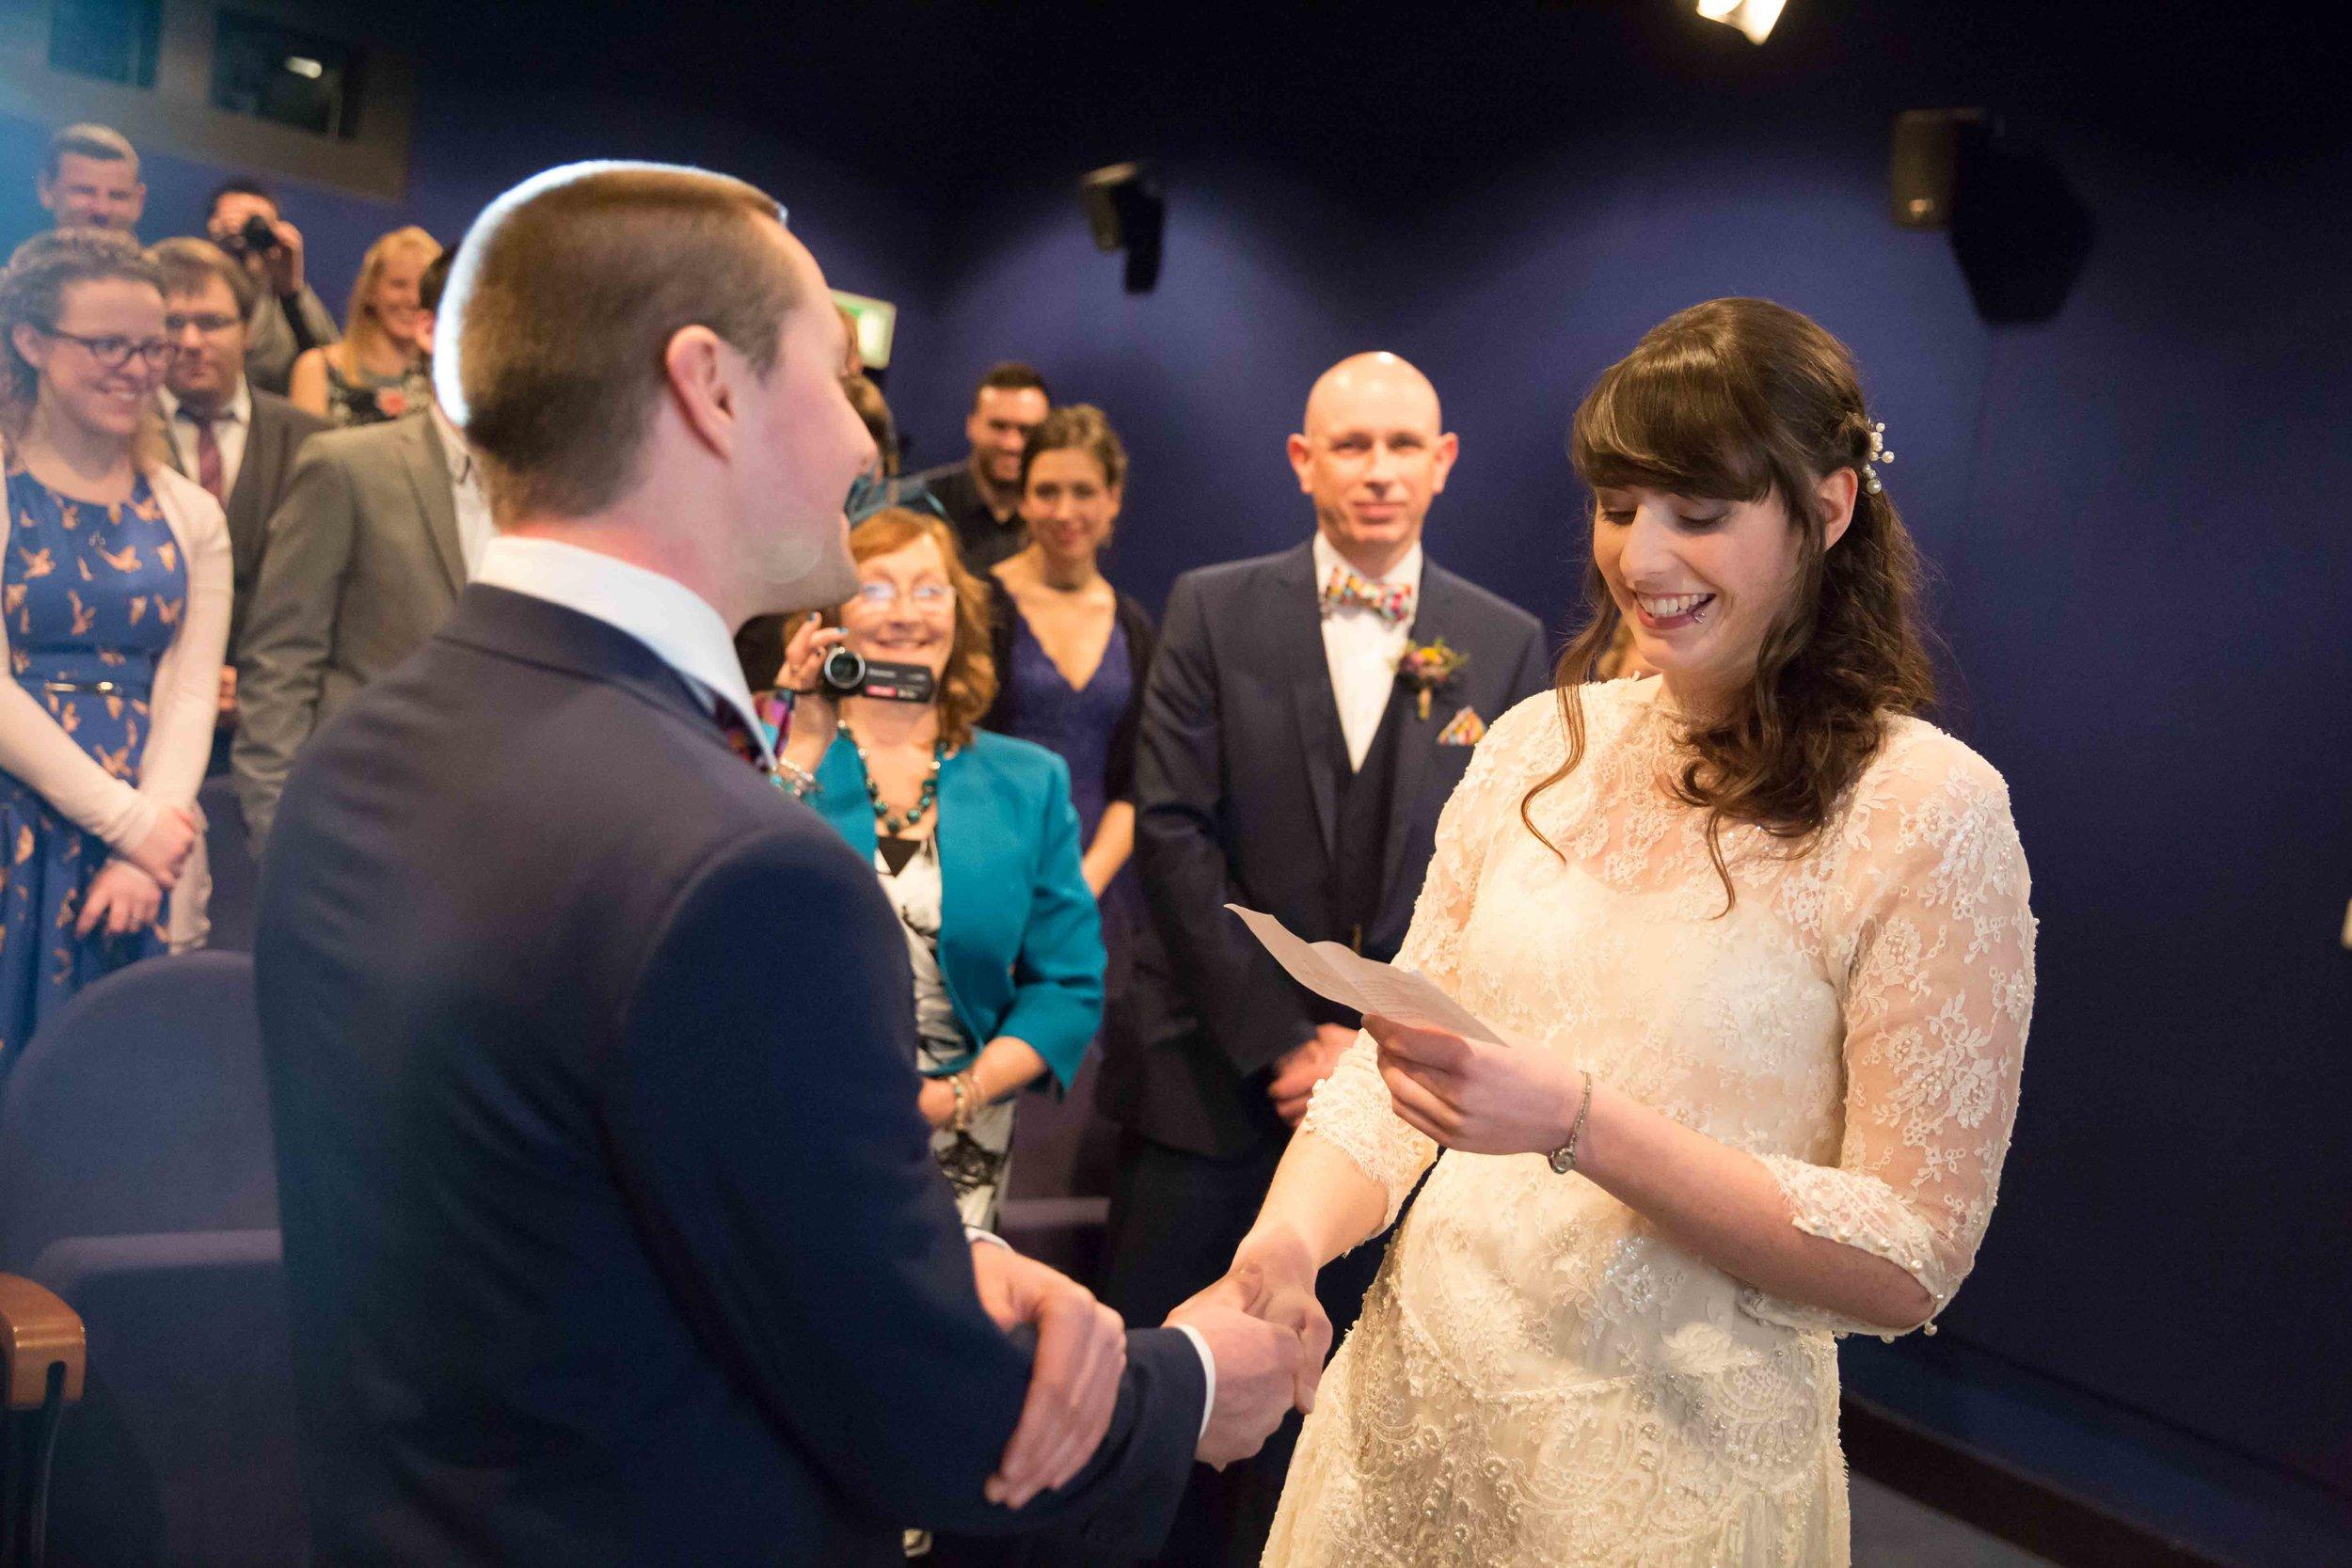 Adam & Faye - Wright Wedding Photography - Bristol Wedding Photographer -114.jpg